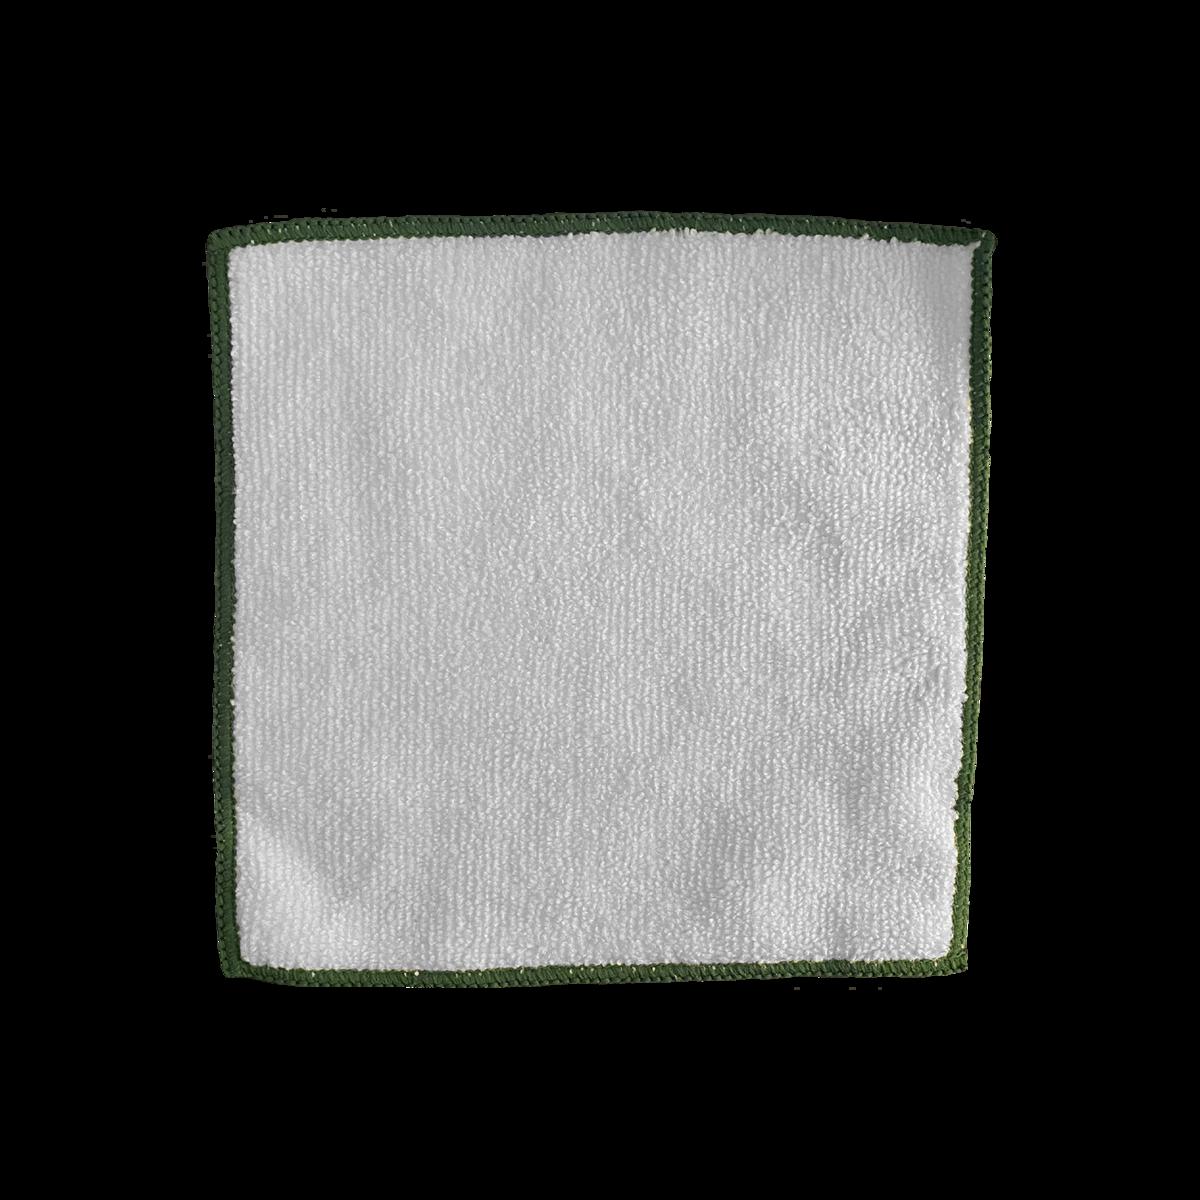 30 Microfiber cloths